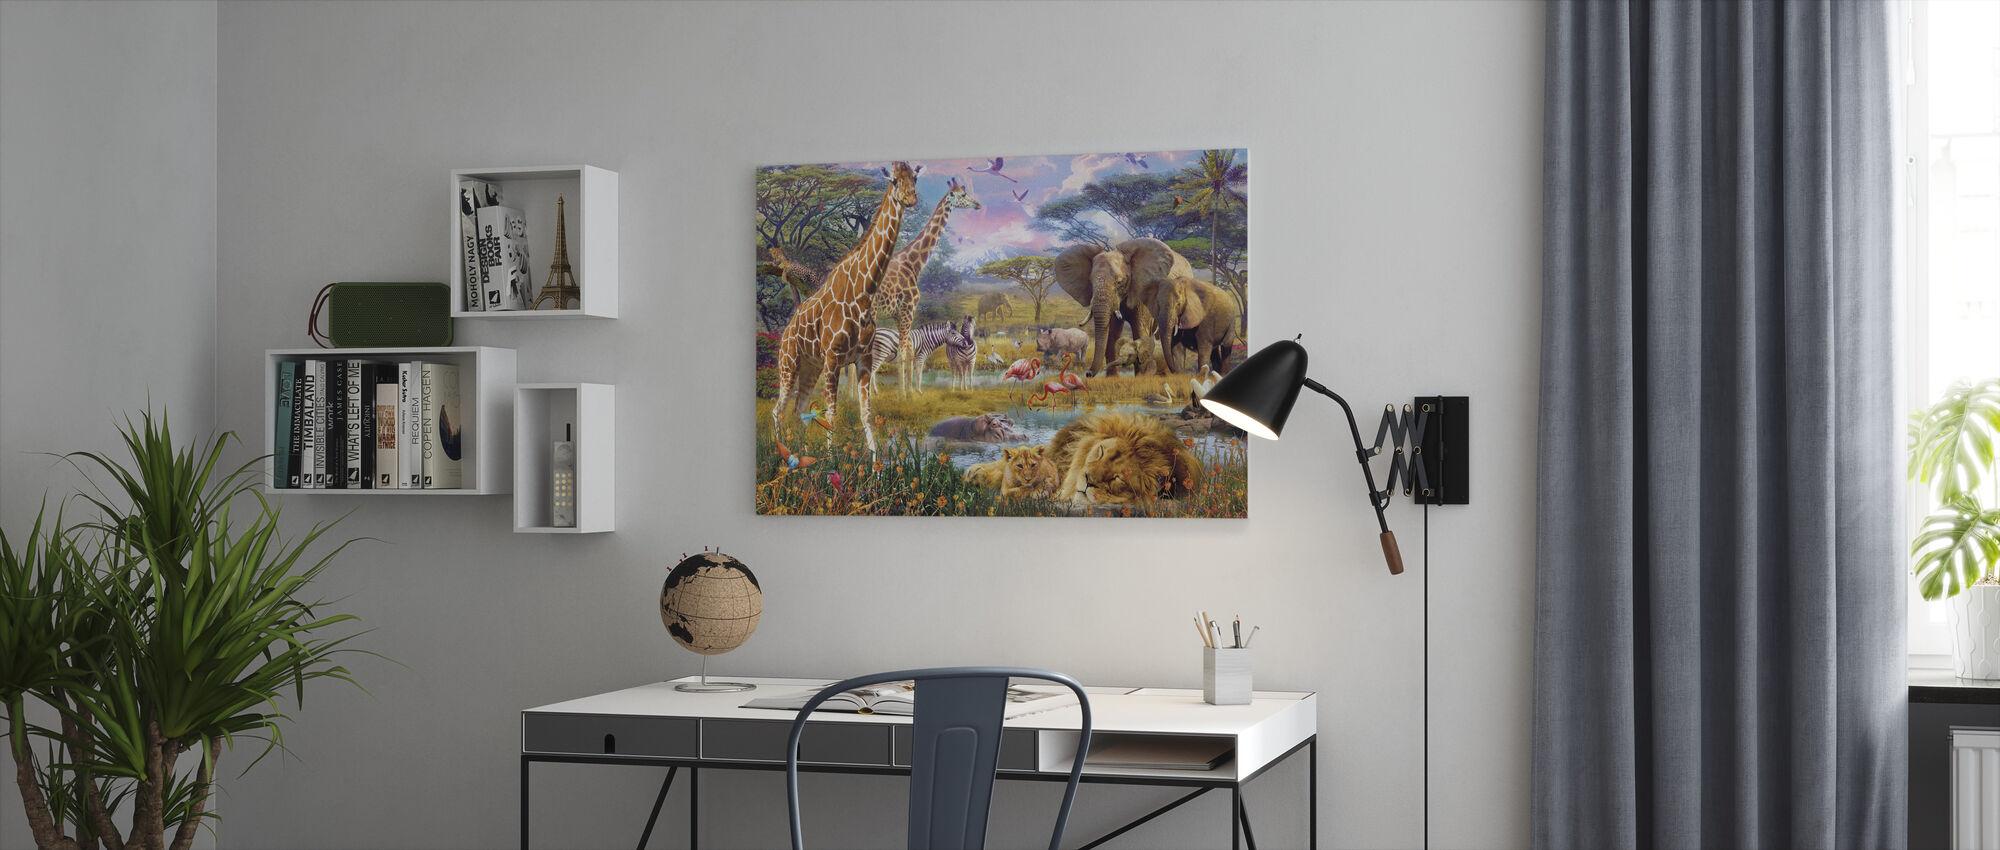 Savannah Animals - Canvas print - Office